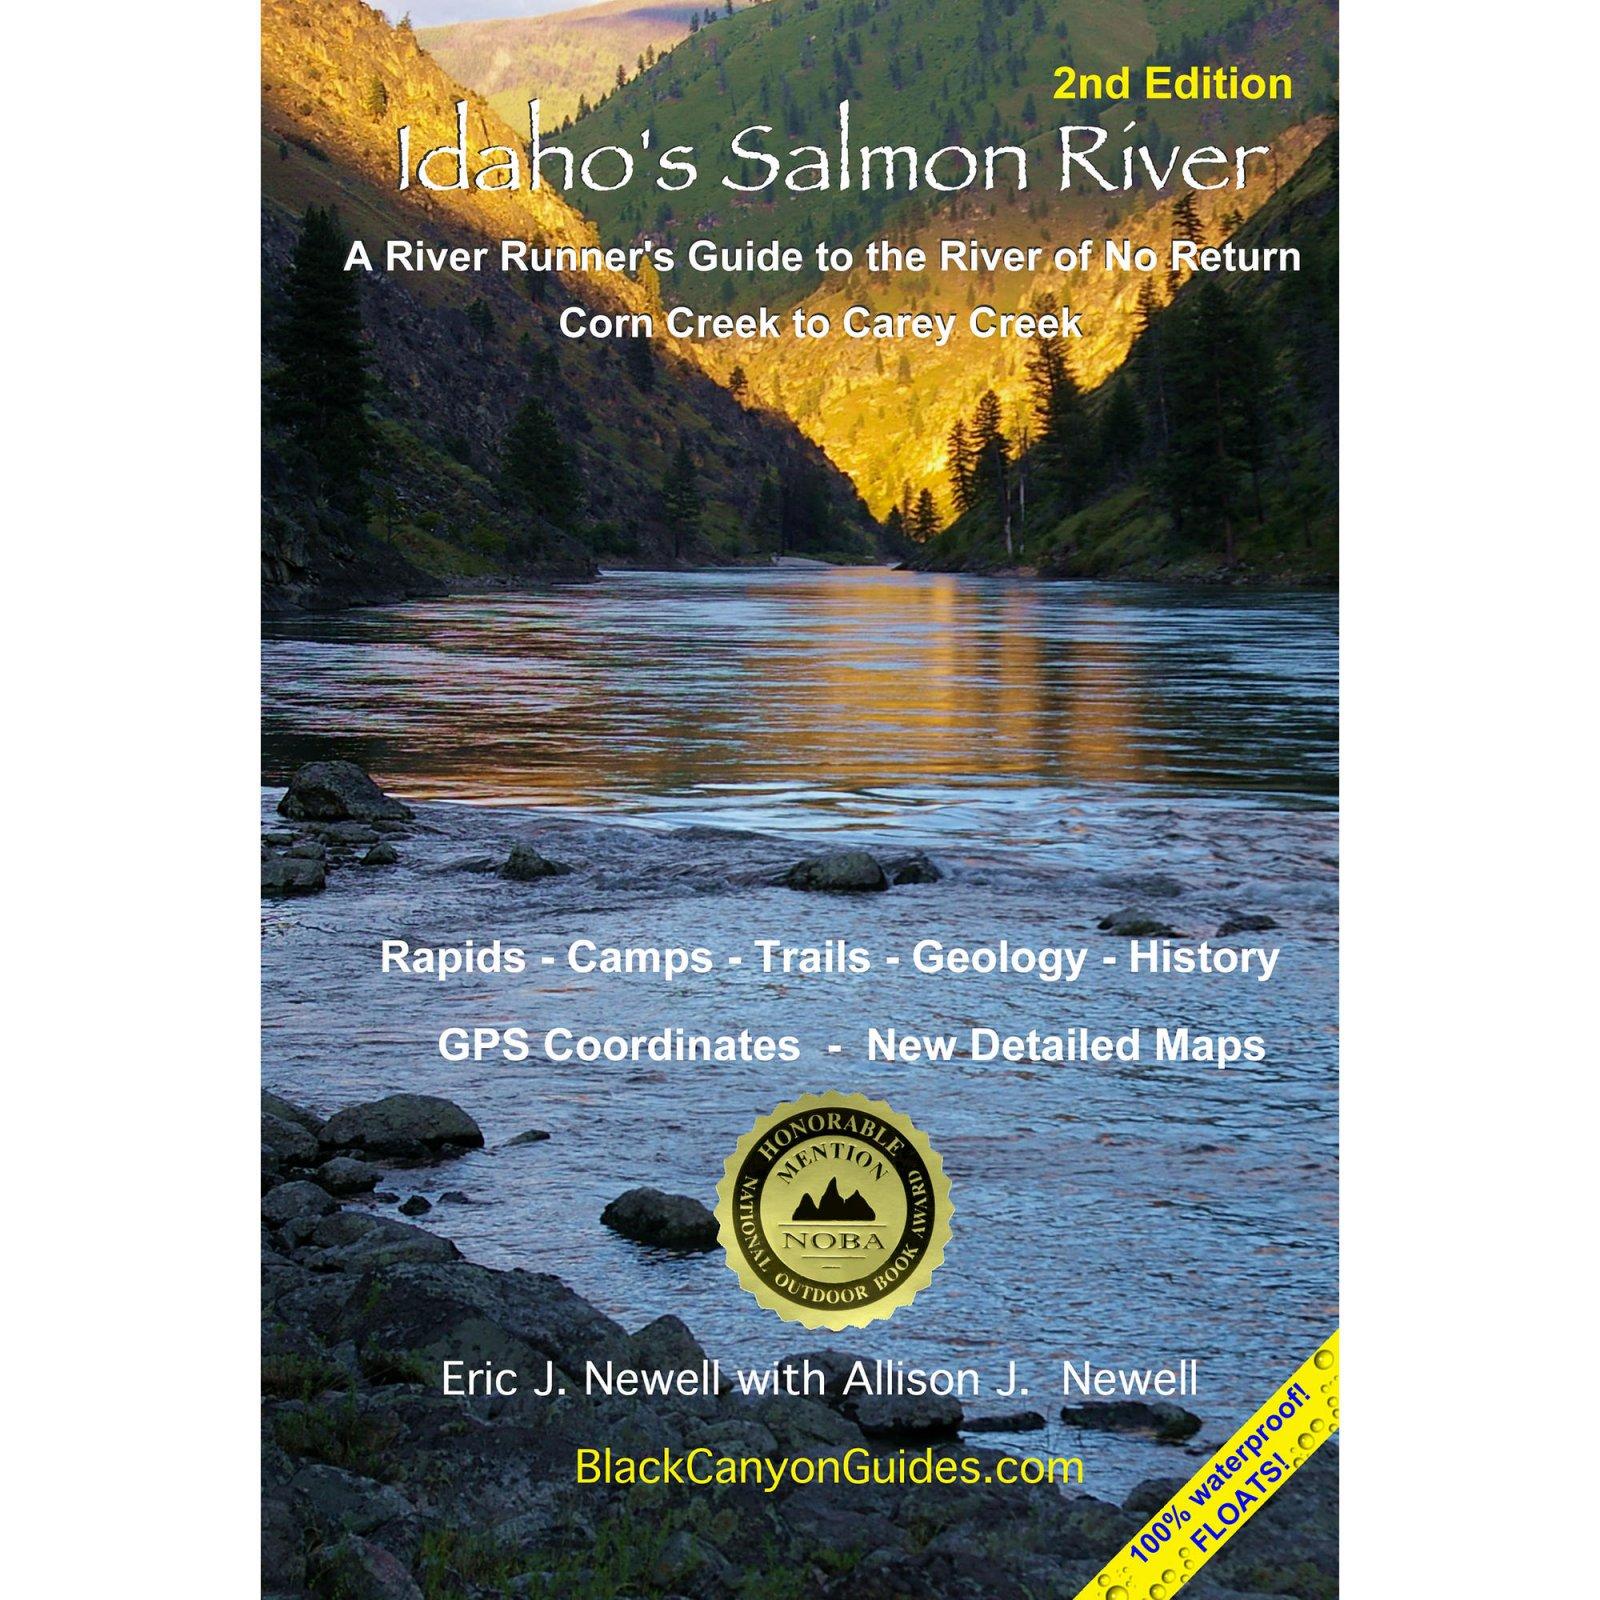 Idaho's Salmon River Guide Book 2nd Ed.